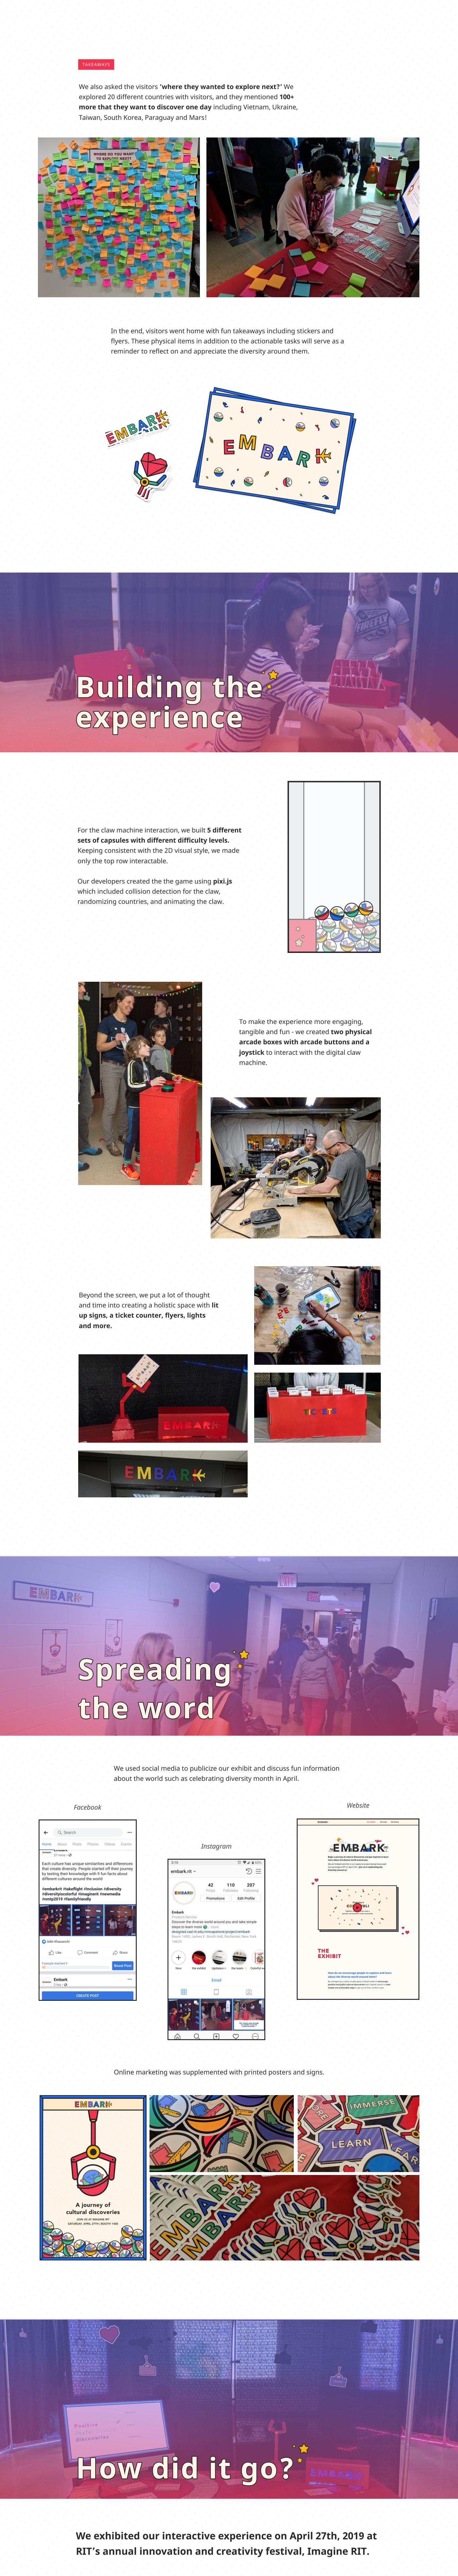 adobeawards,Diversity,Education,Motion Projection,EXHIBIT DESIGN,culture,claw machine,game,interactive exhibit,Captone